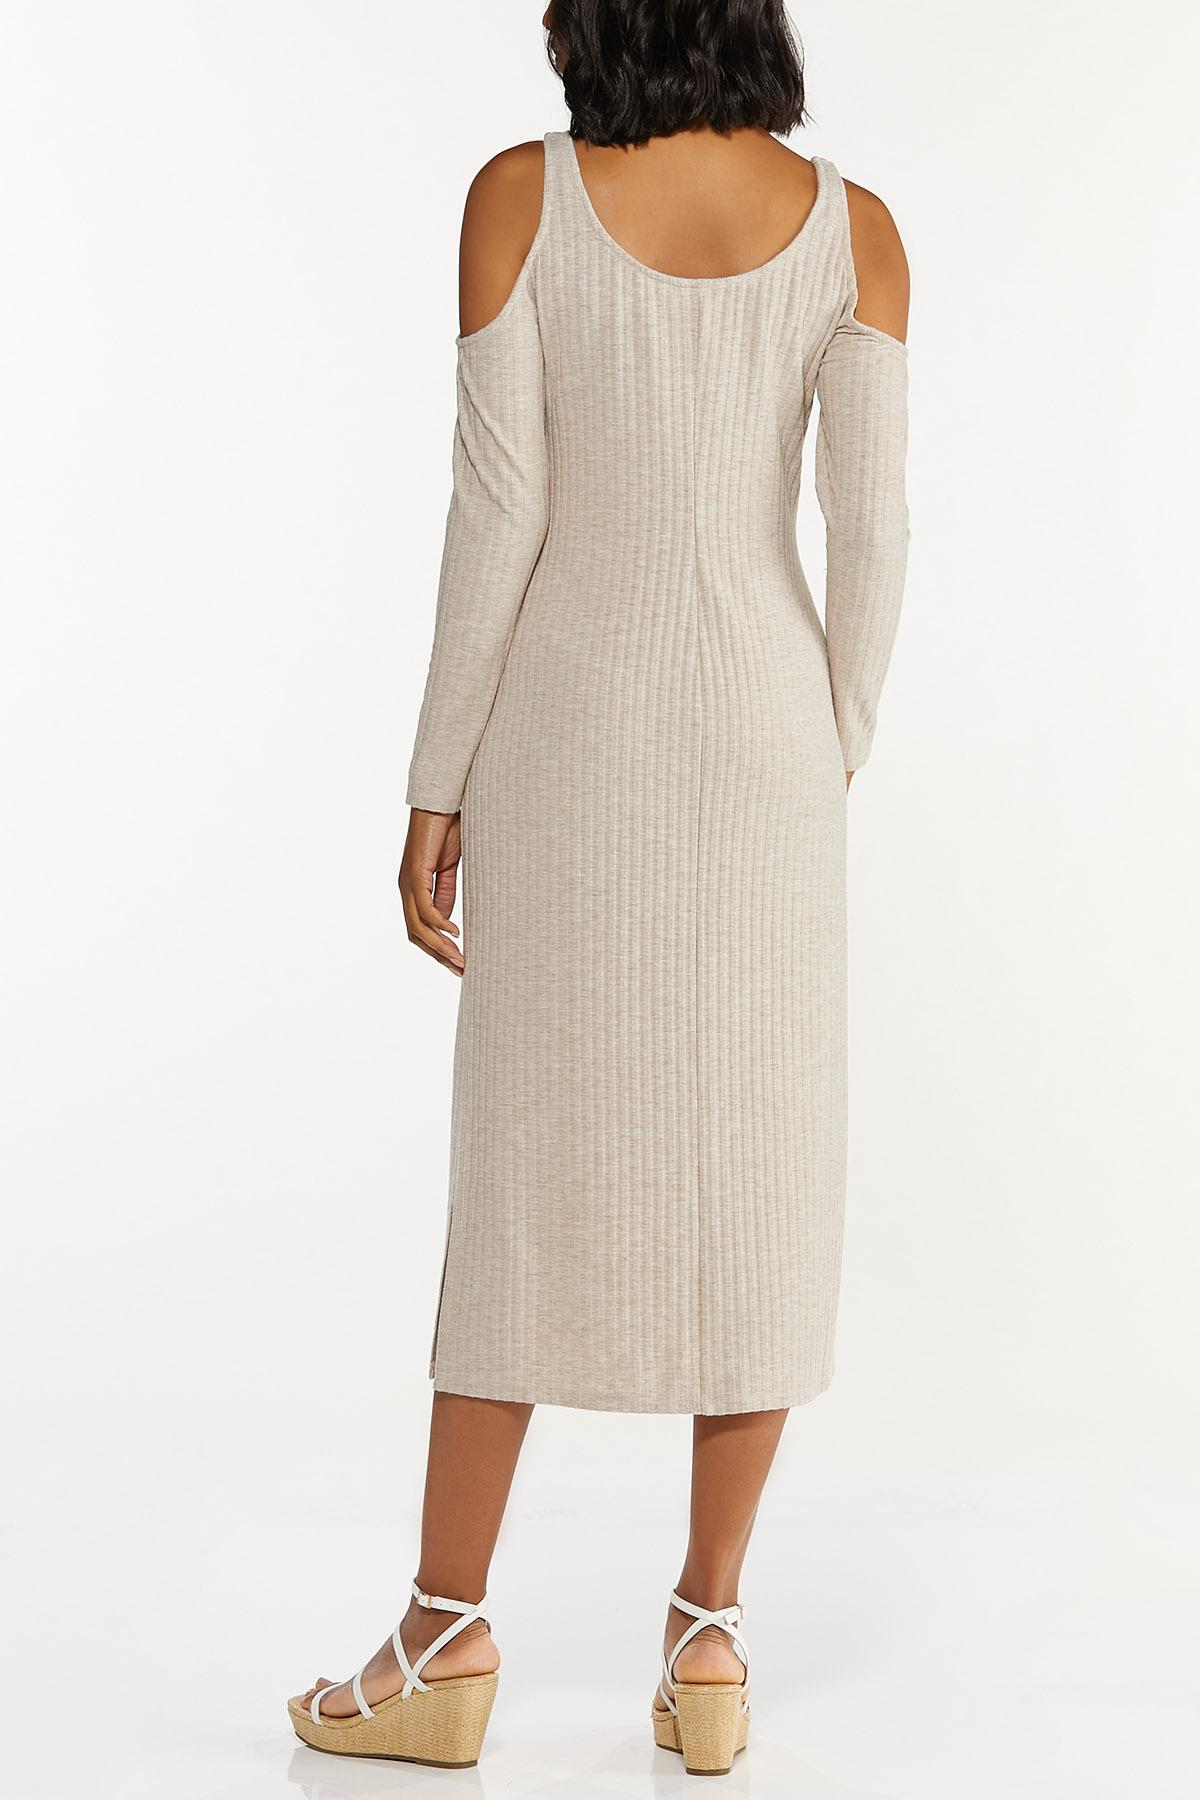 Cold Shoulder Midi Dress (Item #44662375)